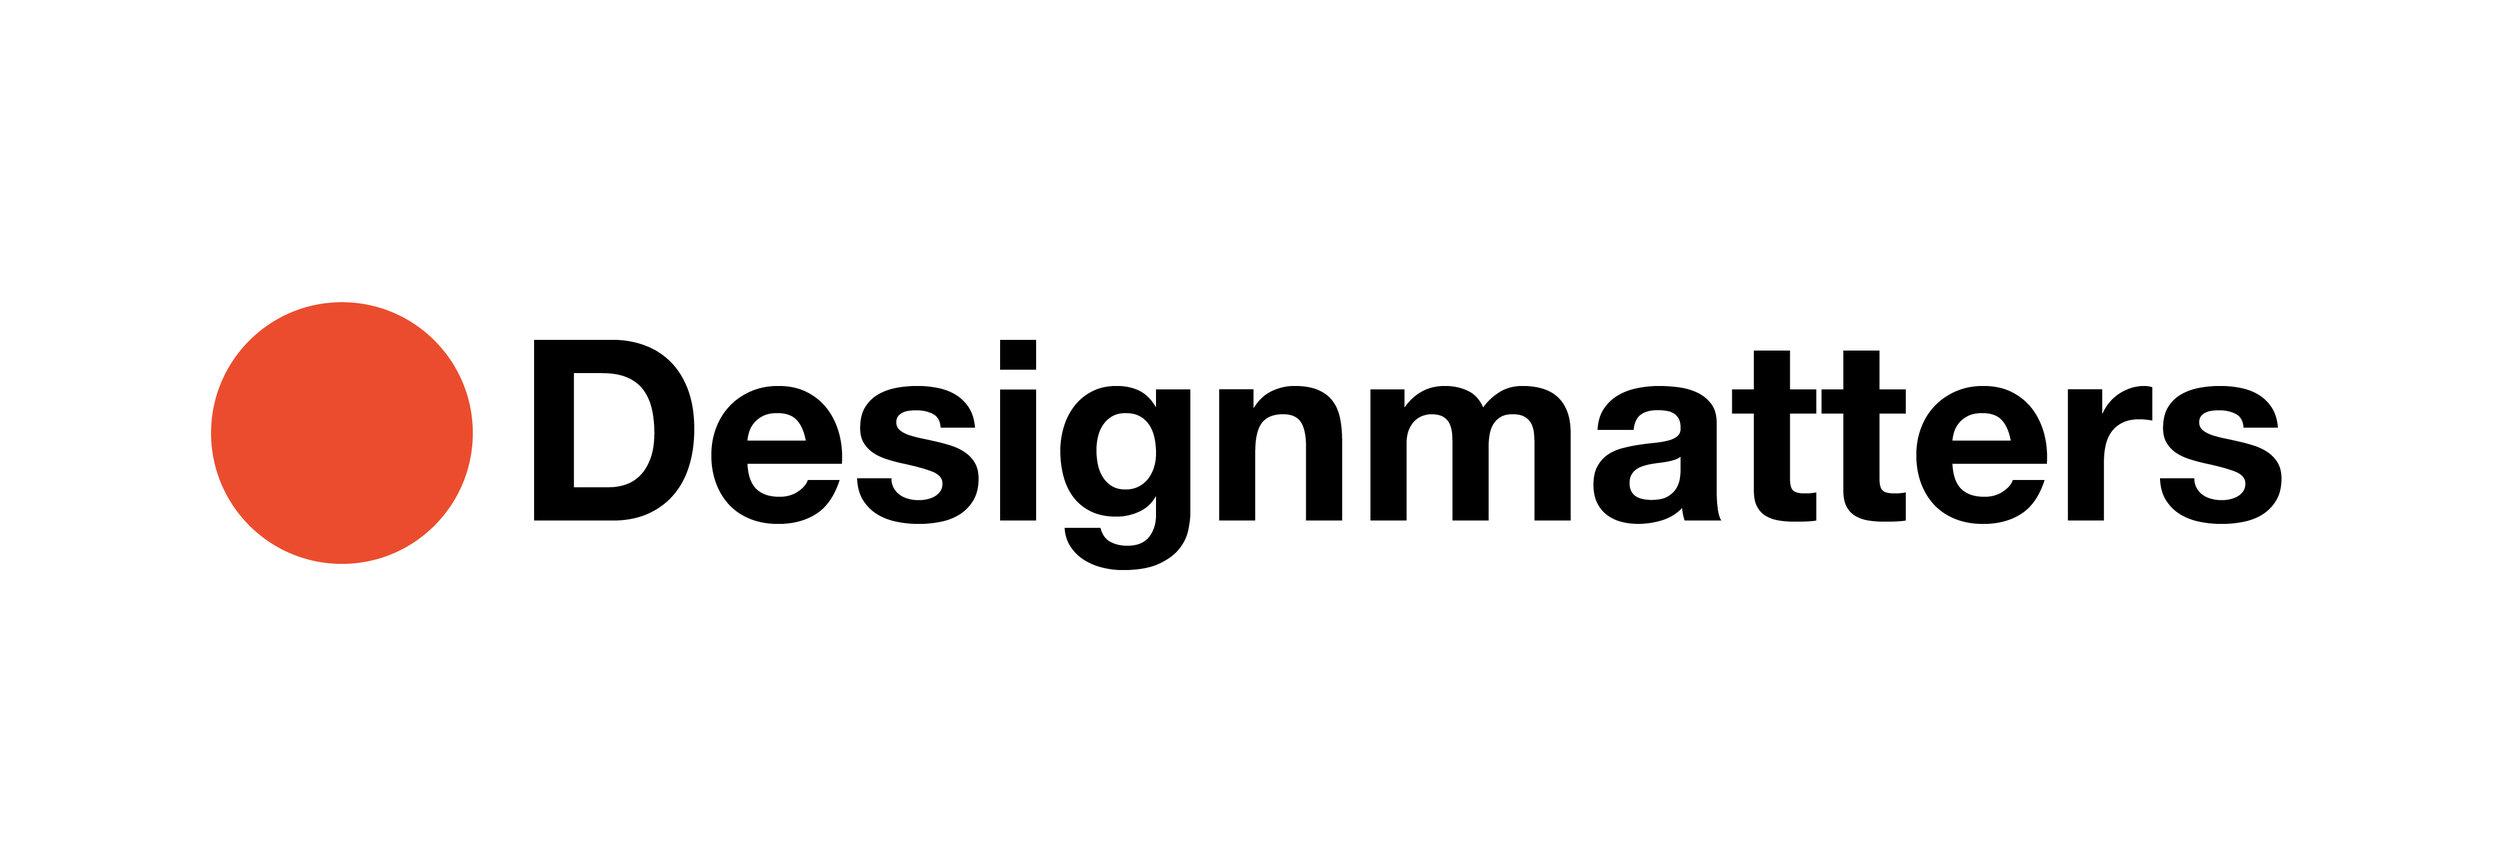 designmatters logo-04.jpg